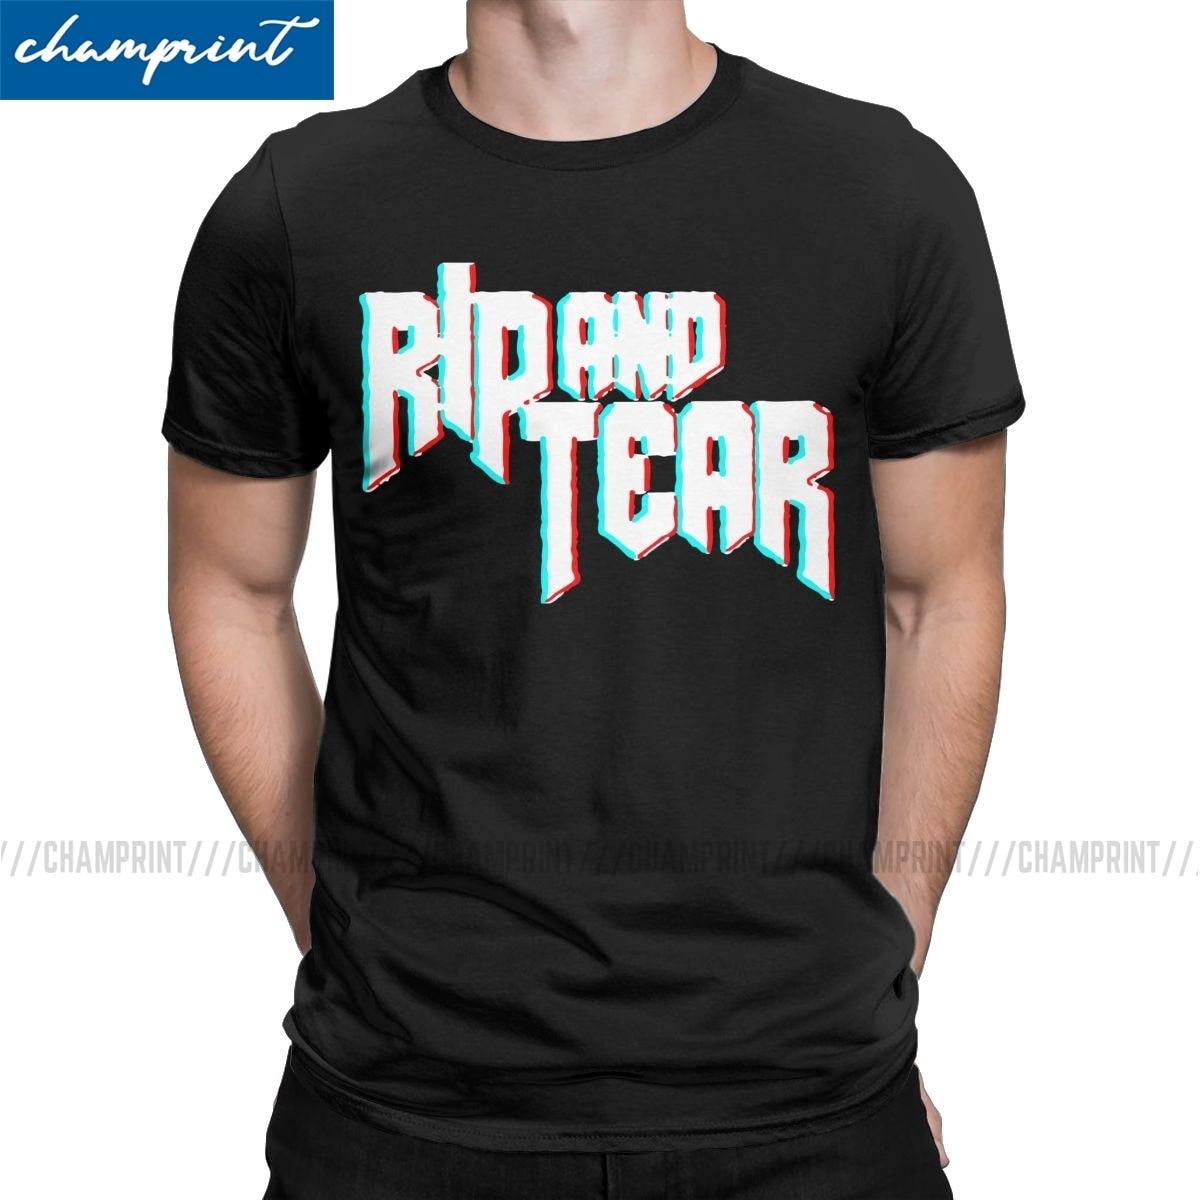 Rip And Tear Doom Eternal t-shirts hombres algodón novedad camiseta Doomguy Doom Slayer Cacodemon Tees de manga corta ropa regalo Idea